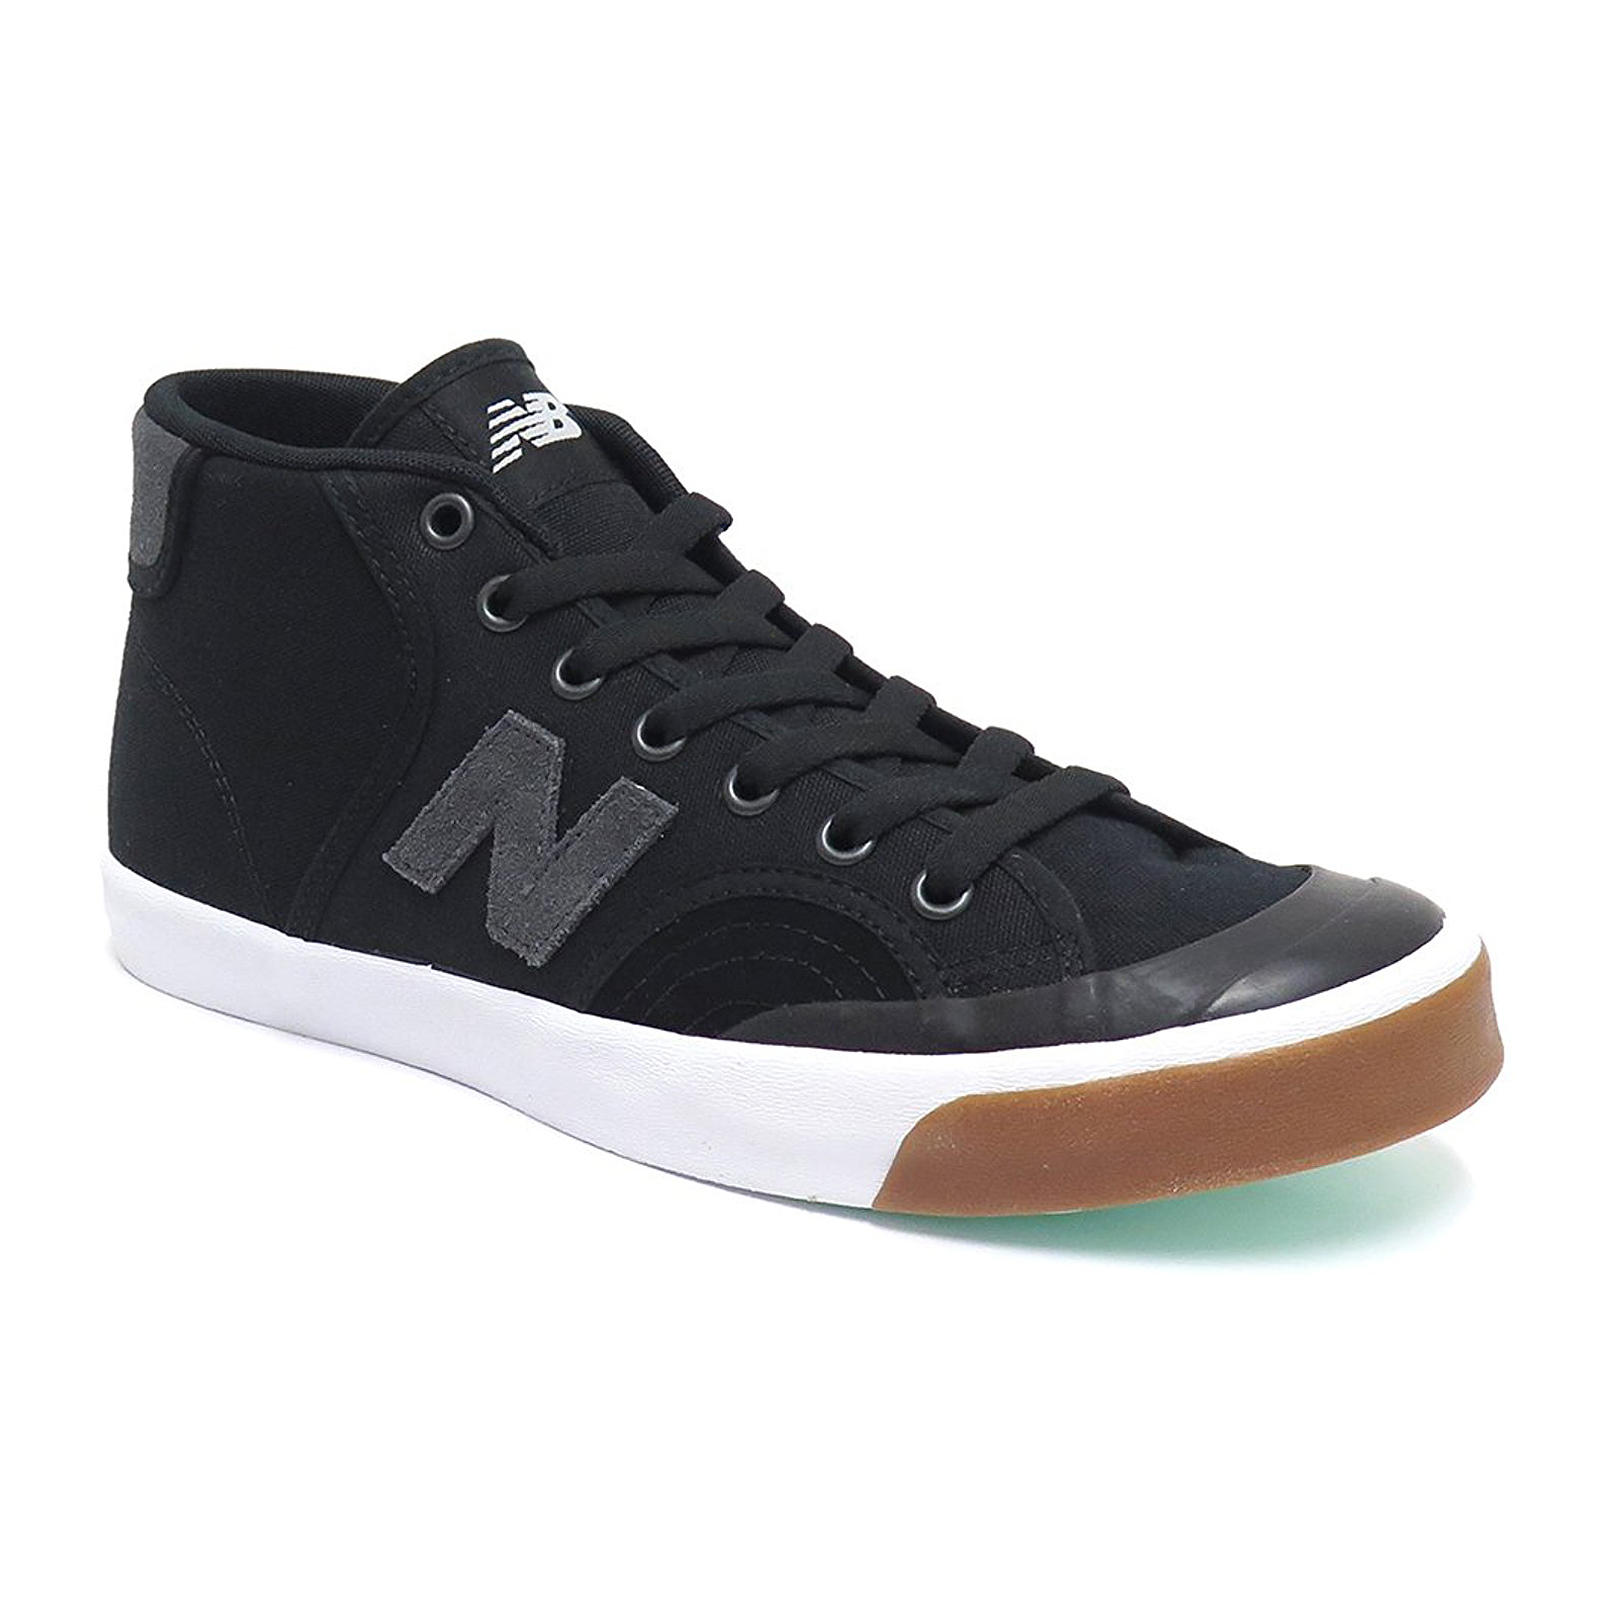 New Balance Sneakers Numeric Skateboarding noir/ Gris  Canvas / Suede Nero